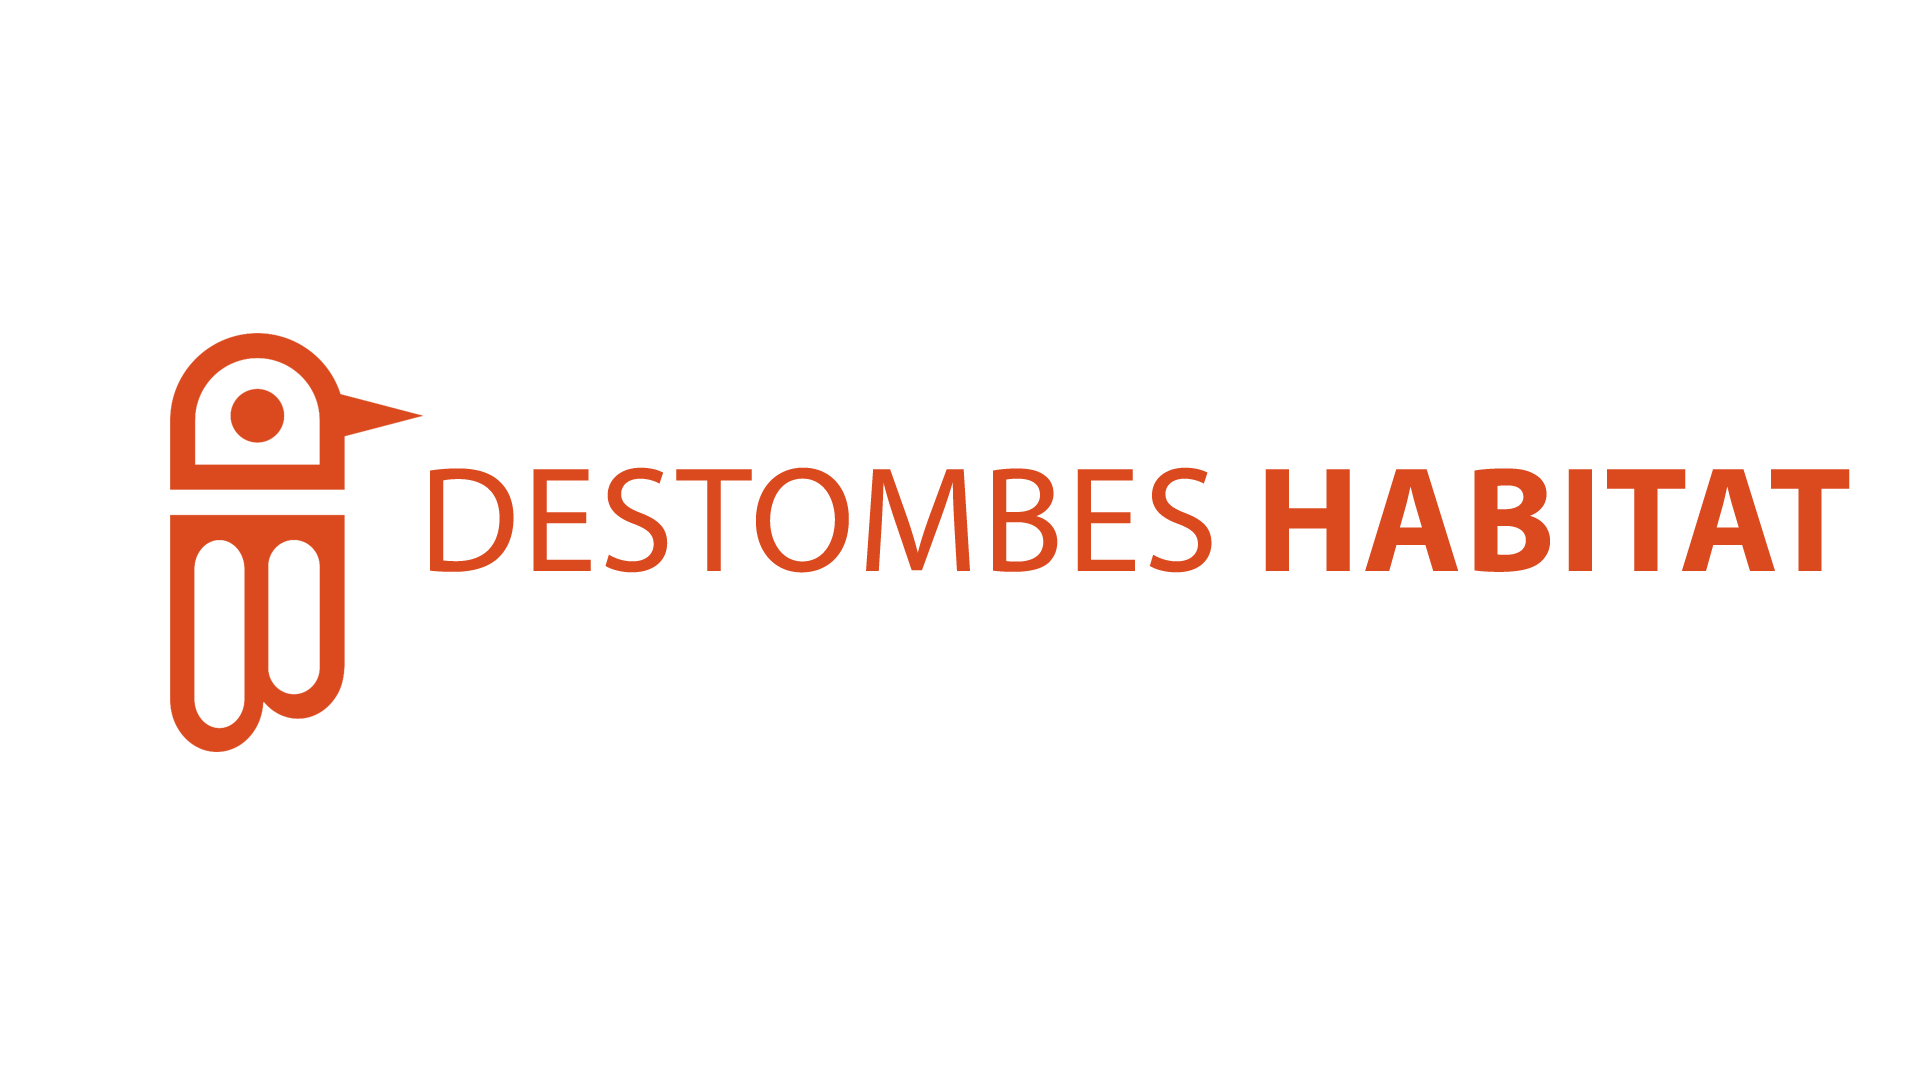 logo destombes habitat